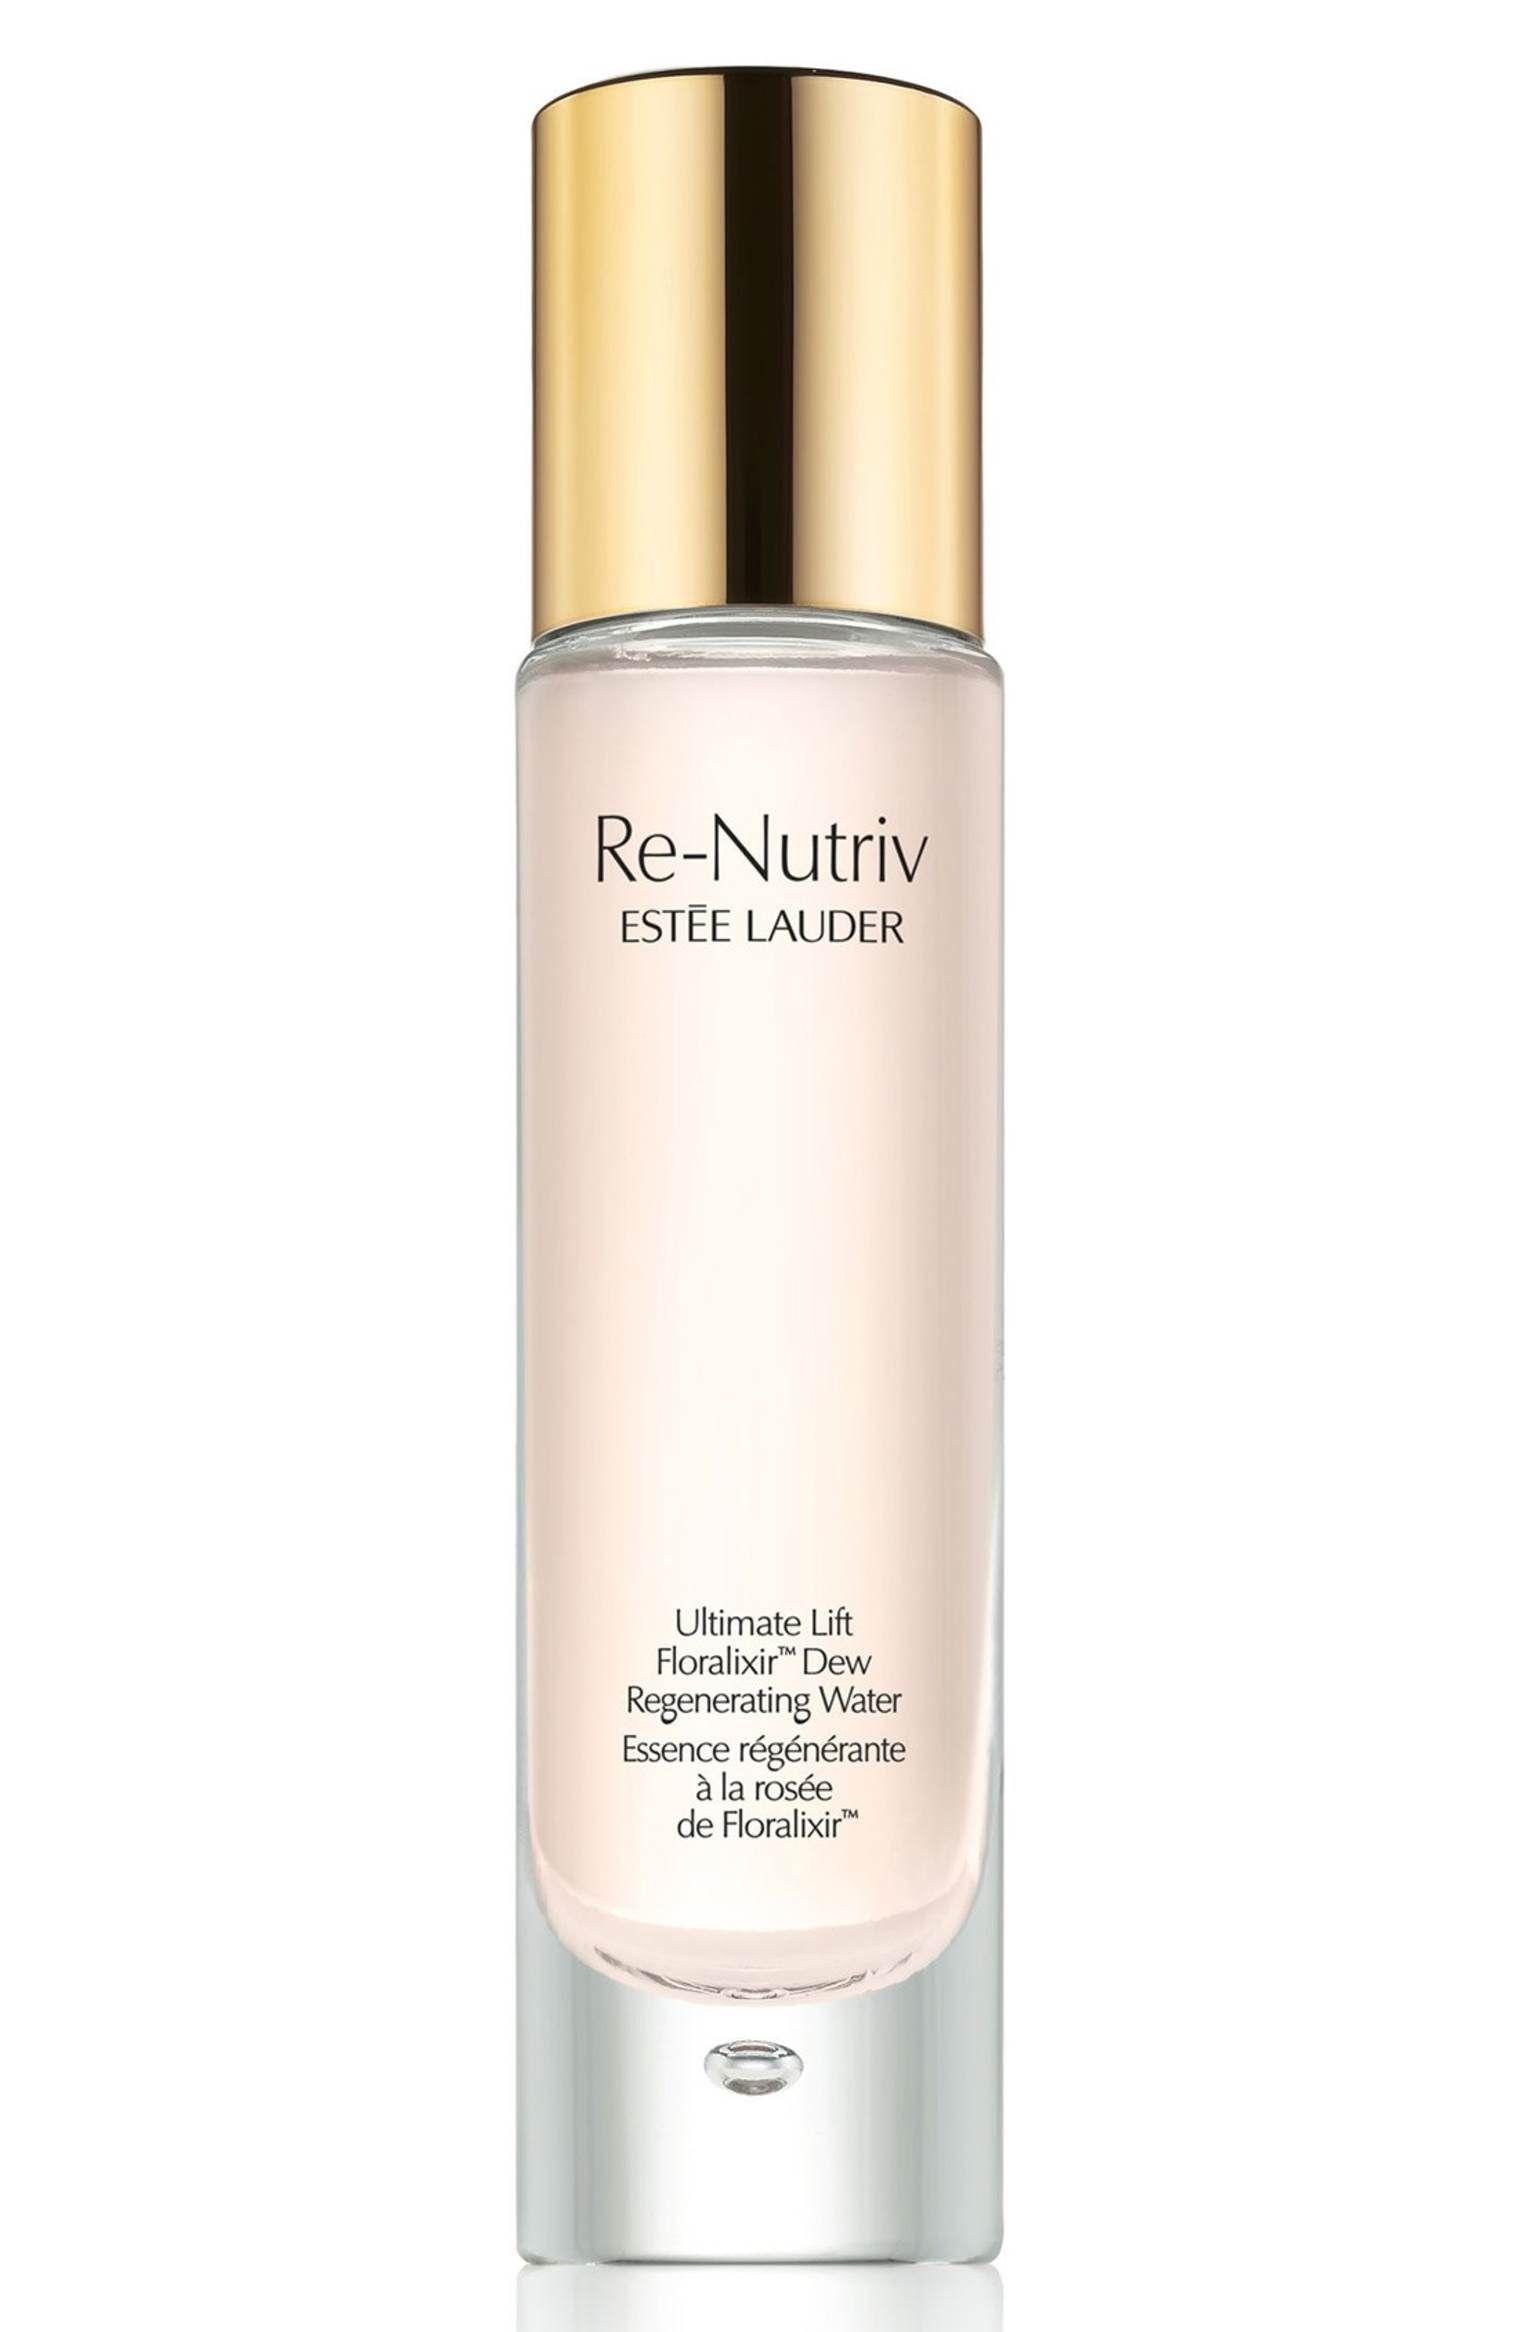 Estee Lauder Re Nutriv Ultimate Lift Floralixir Dew Regenerating Water Soin Du Corps Visage Sephora